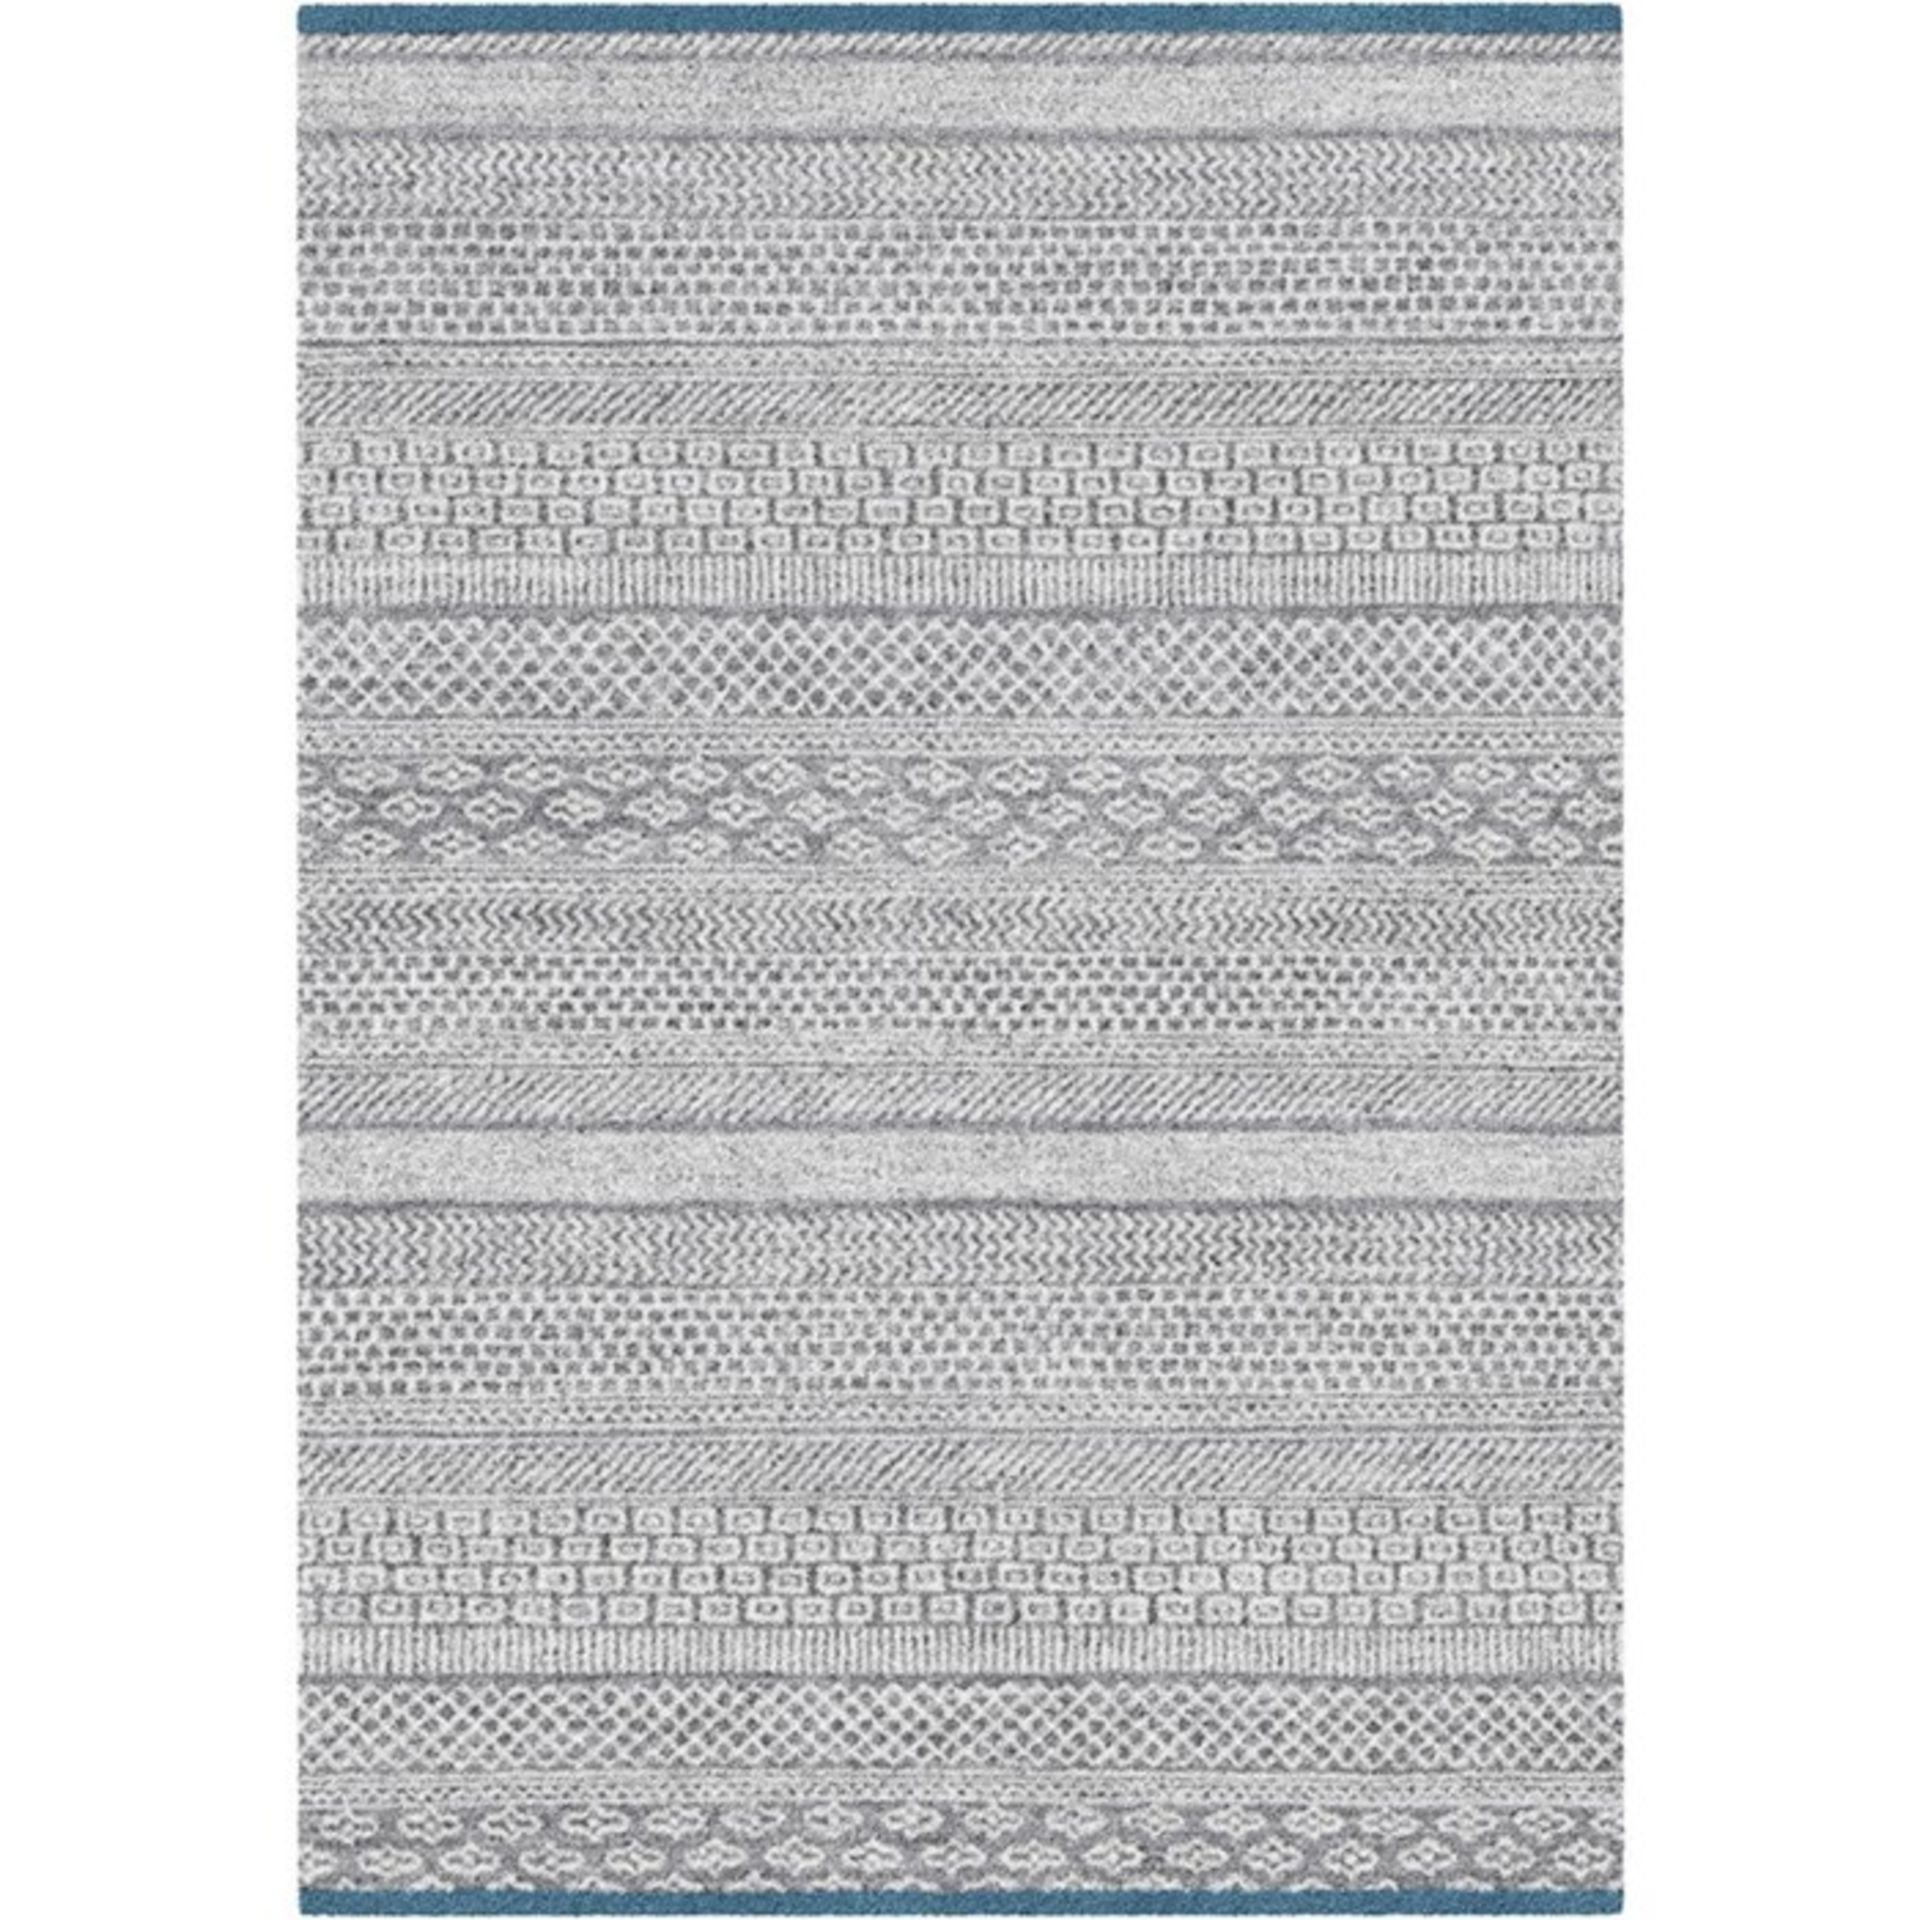 World Menagerie,Needham High Pile Ethnic Grey/Blue Rug RRP -£ 60.99(18267/57 -LLFY1426)